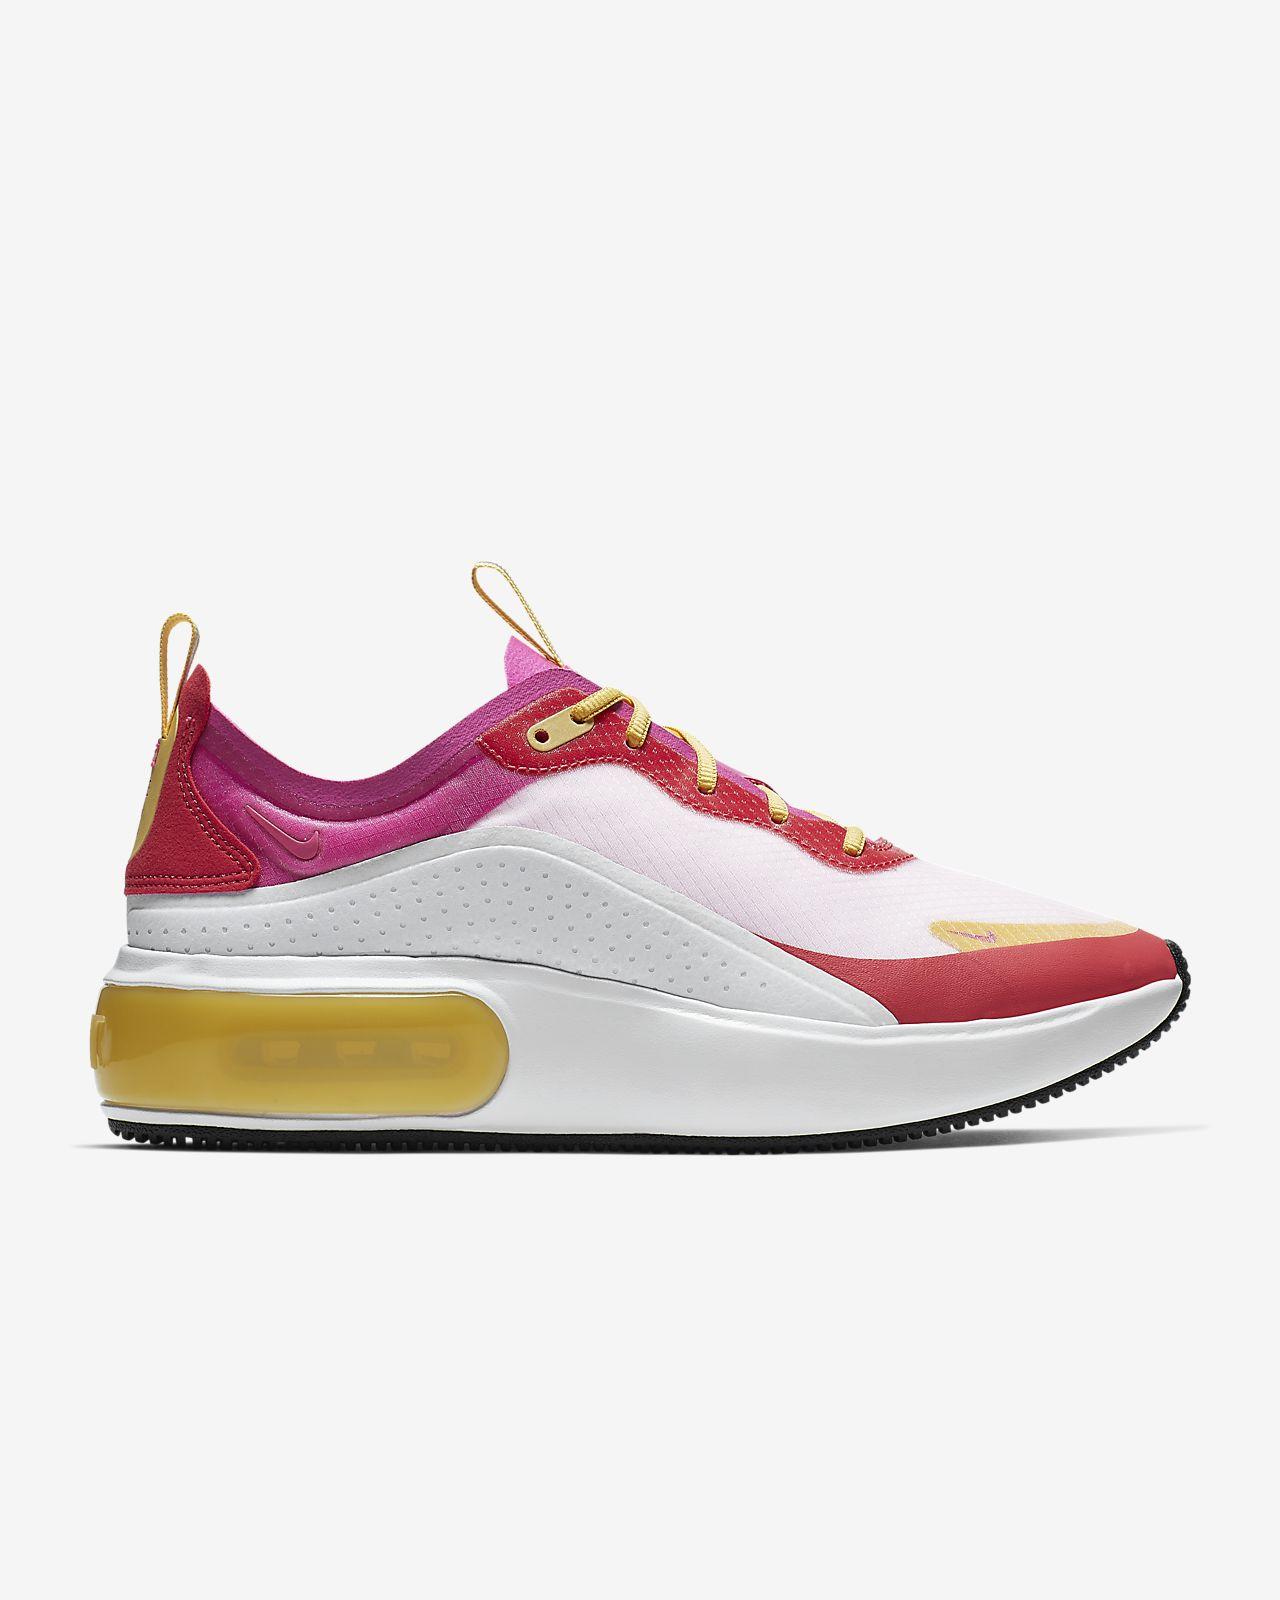 check out 3c890 d1dd5 ... Nike Air Max Dia SE Shoe